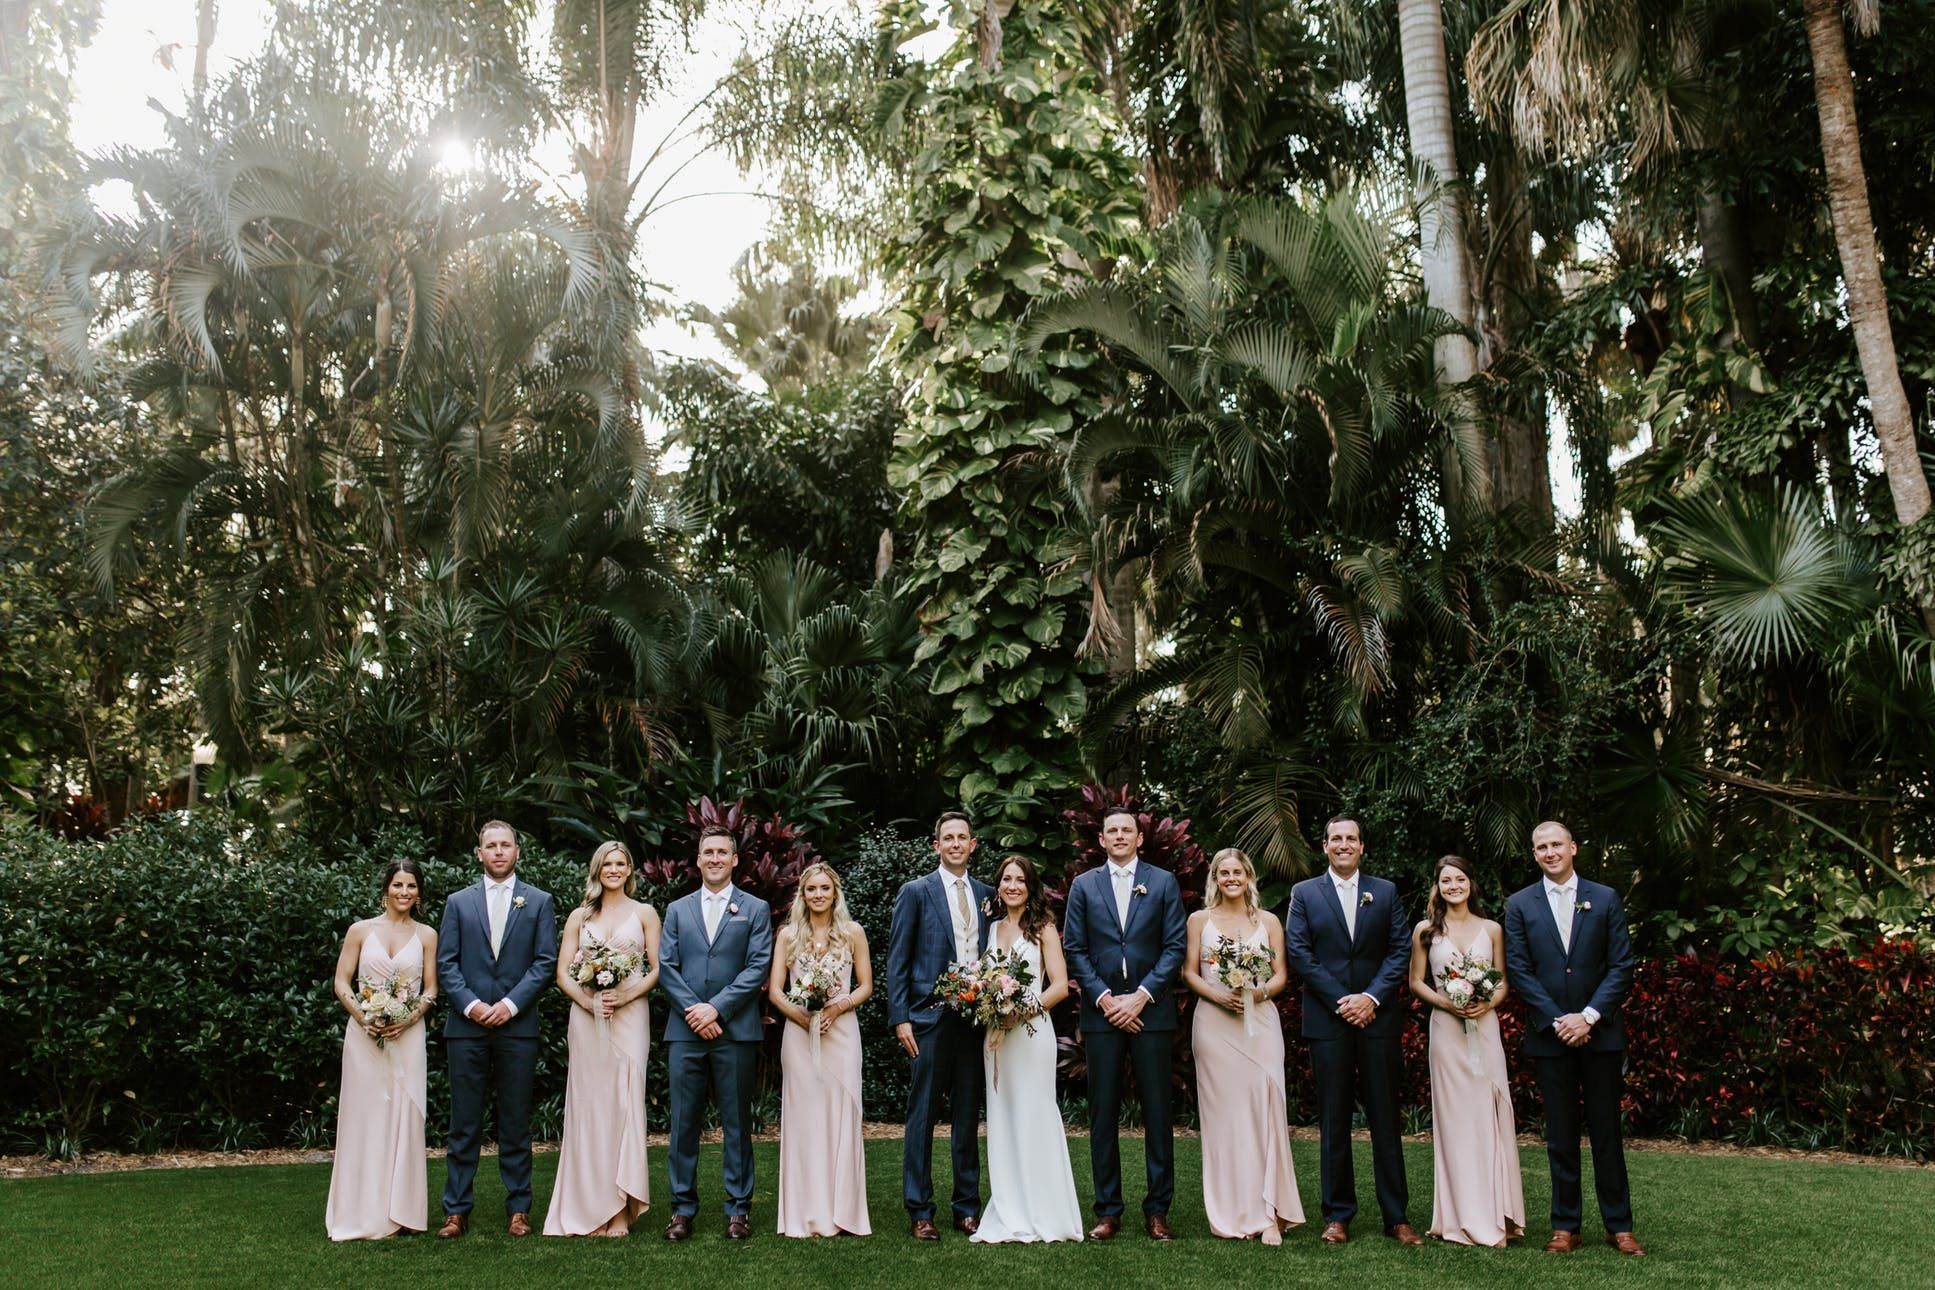 See Sunken Gardens, a beautiful Tampa Bay wedding venue